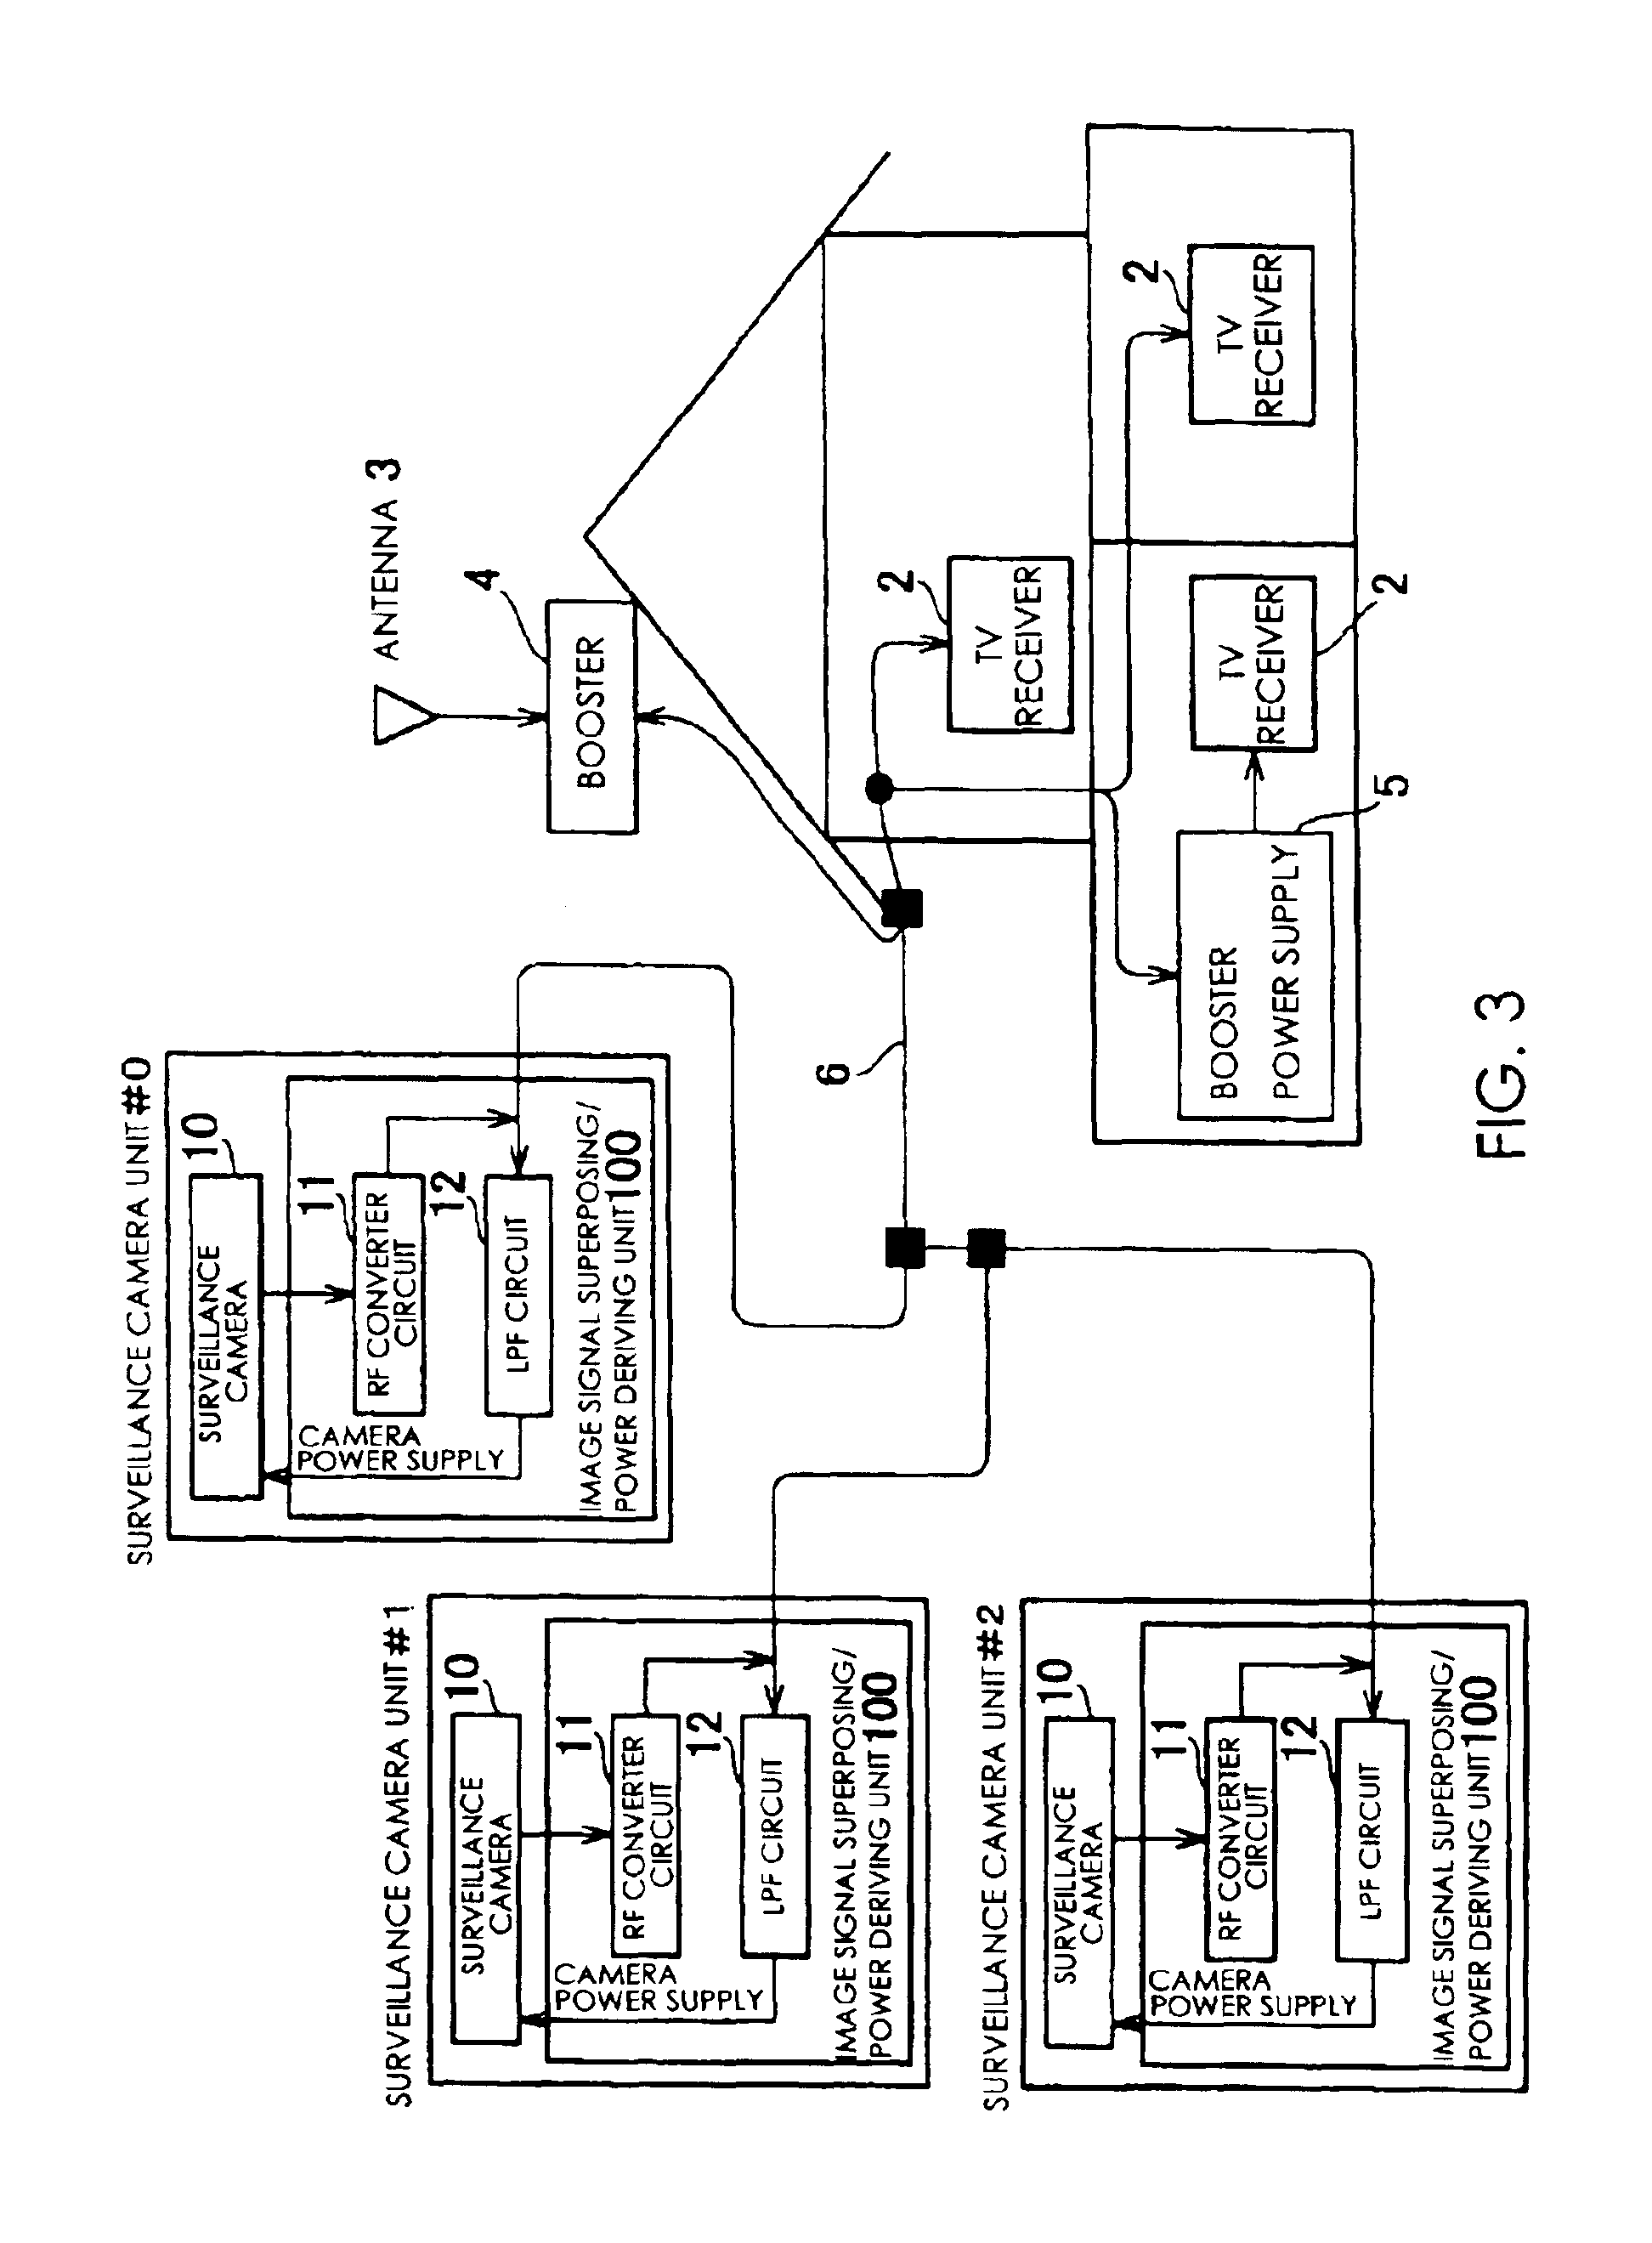 heat 1995 suburban wiring diagram  heat  free engine image for user manual download